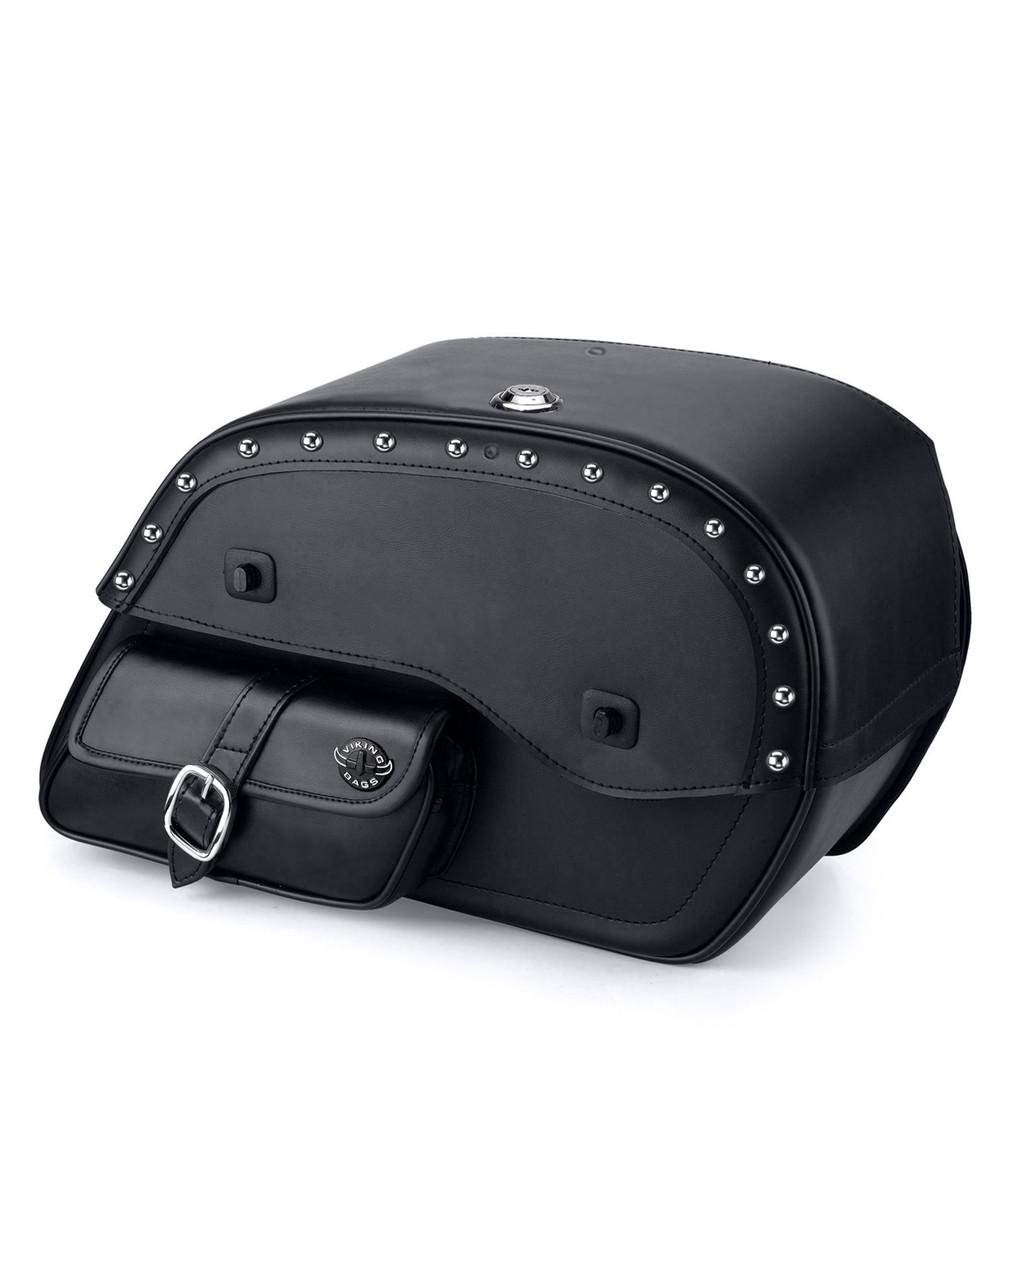 Honda 1500 Valkyrie Interstate Side Pocket Studded Motorcycle Saddlebags Main Bag  View